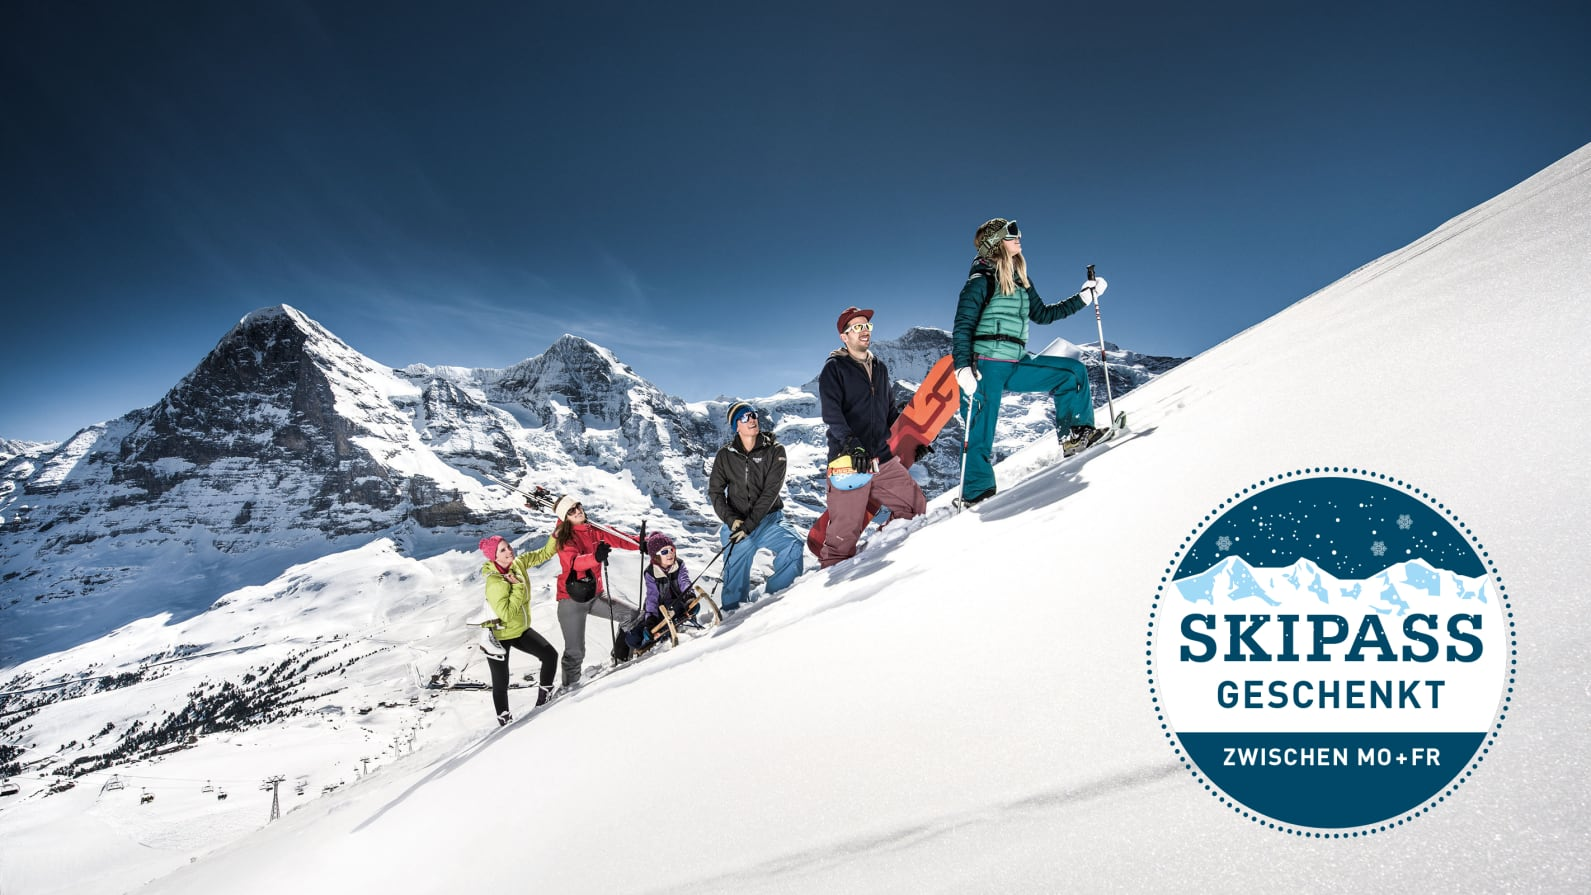 Jungfrau Ski Region Wer das Beste will